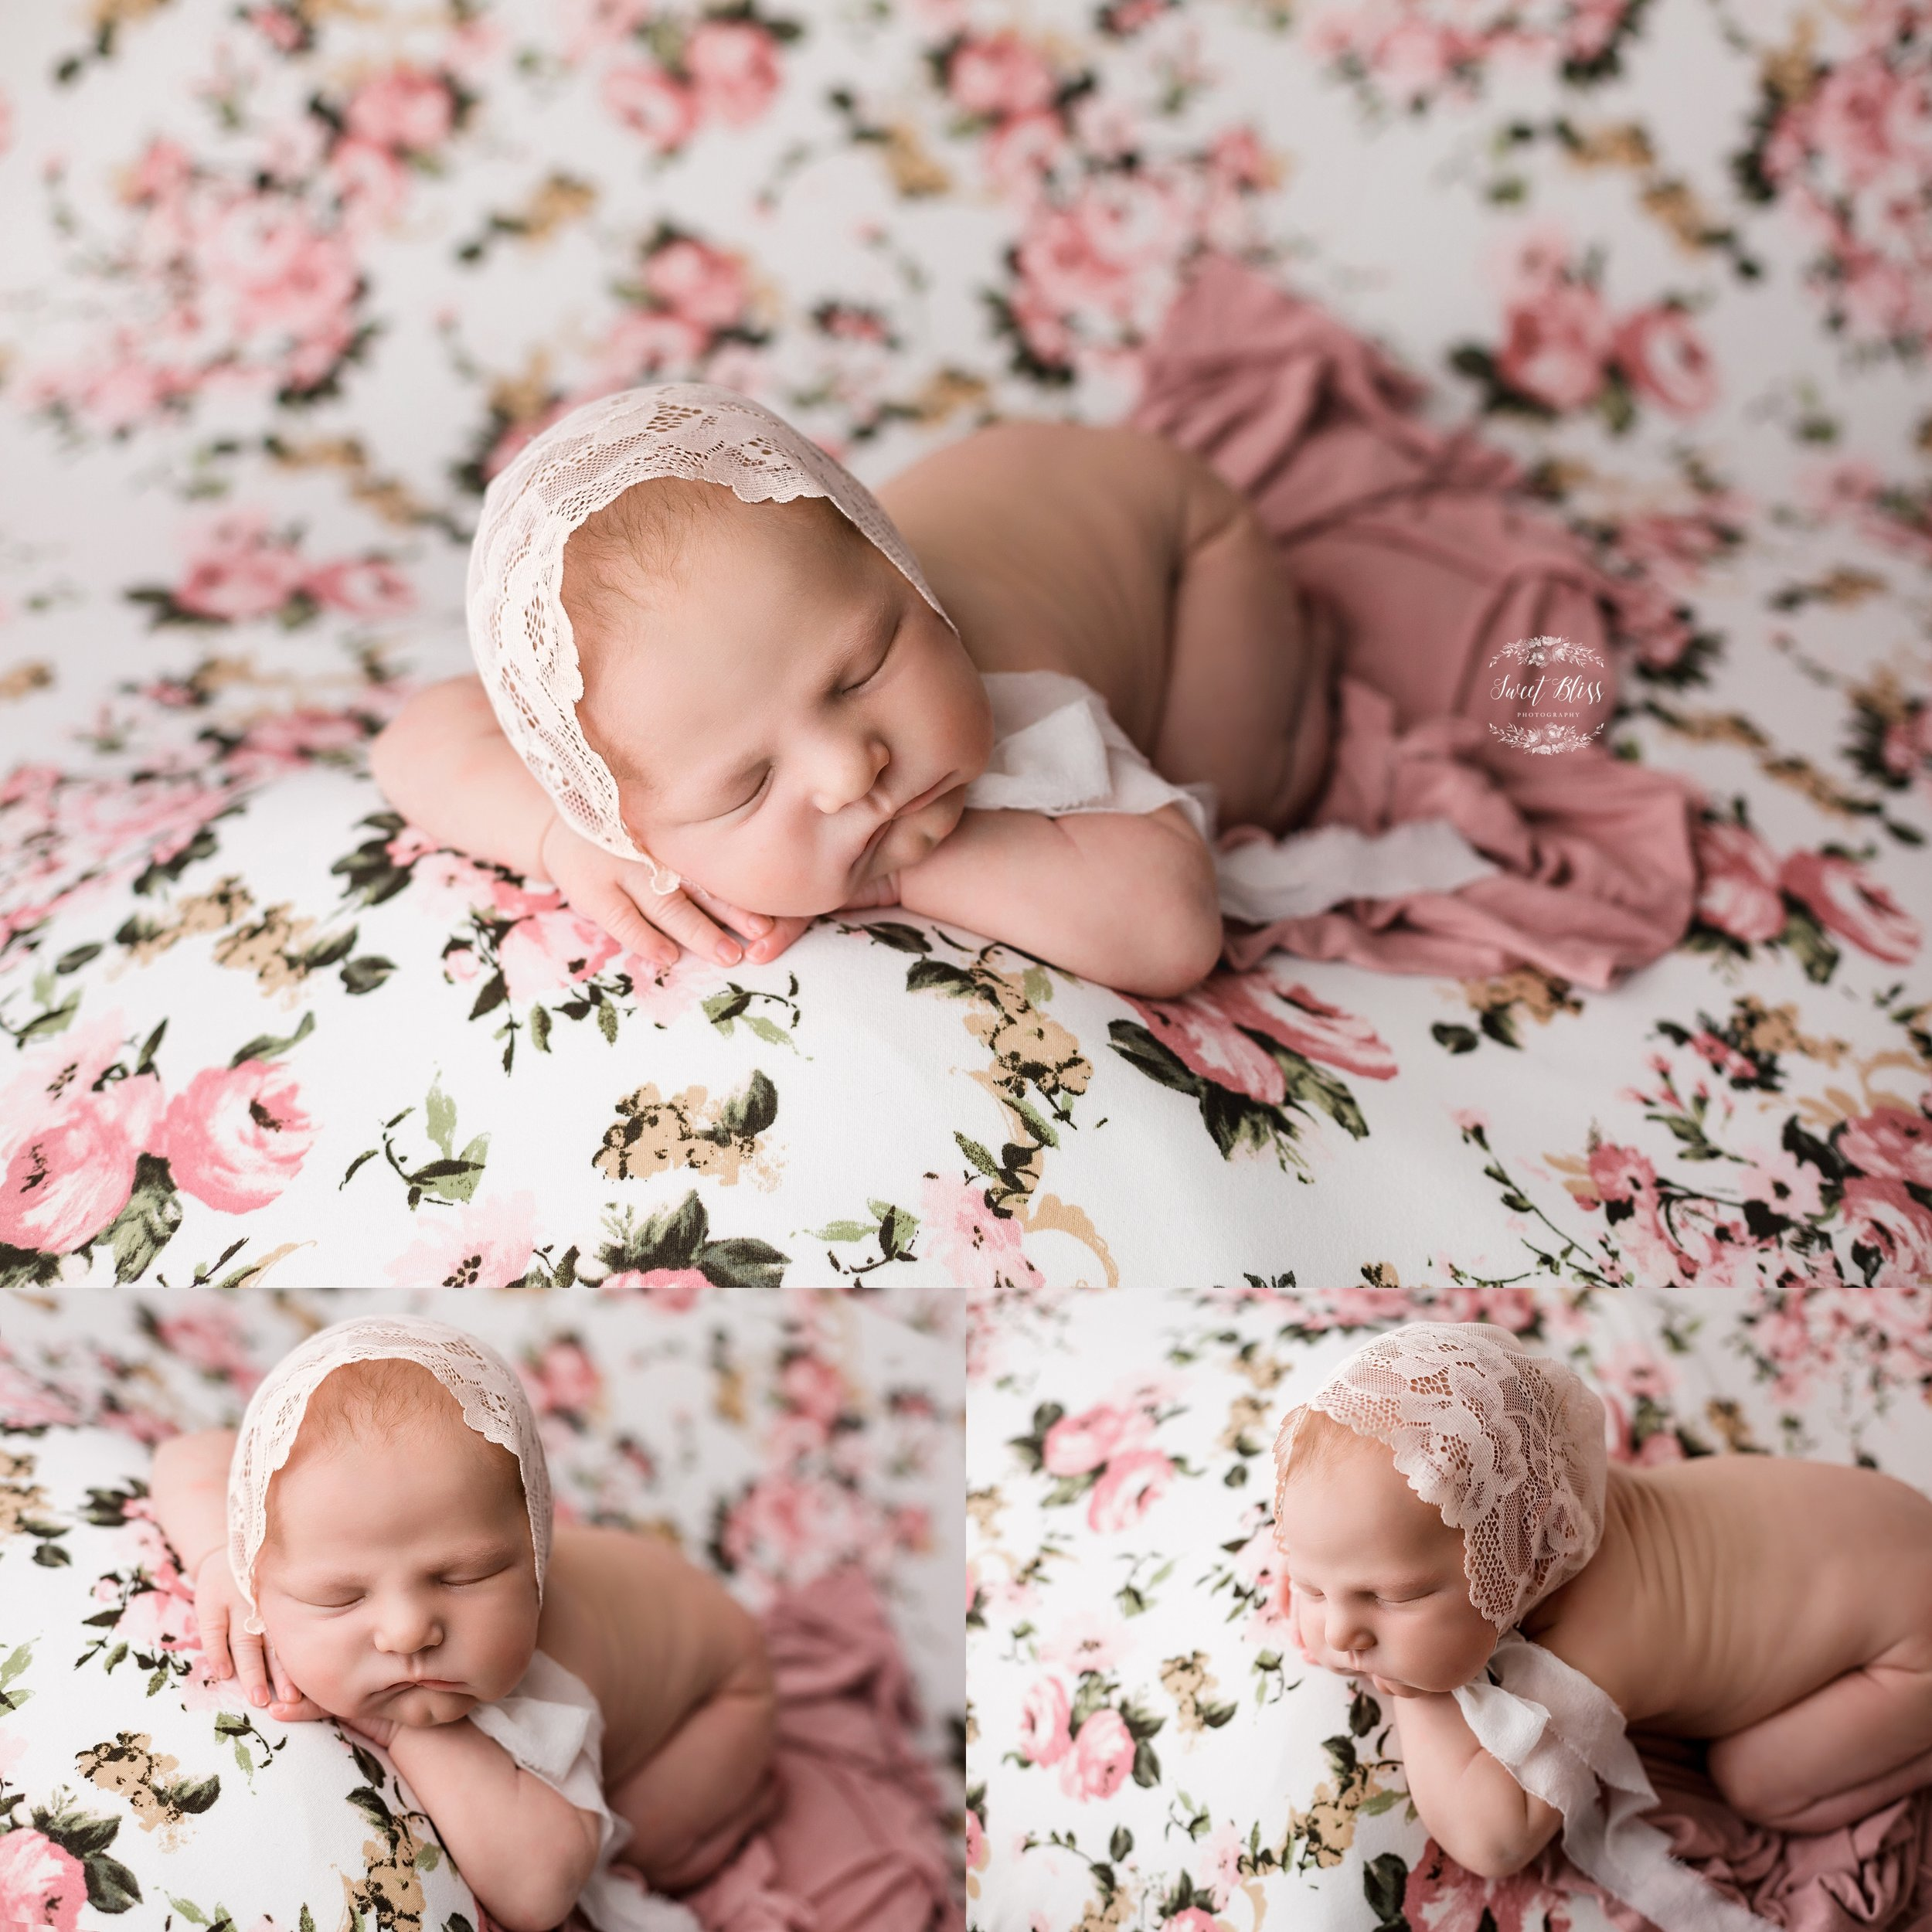 sweetblissphoto_newbornphotographer_Baltimorenewbornphotographer_babyphotographymaryland.jpg